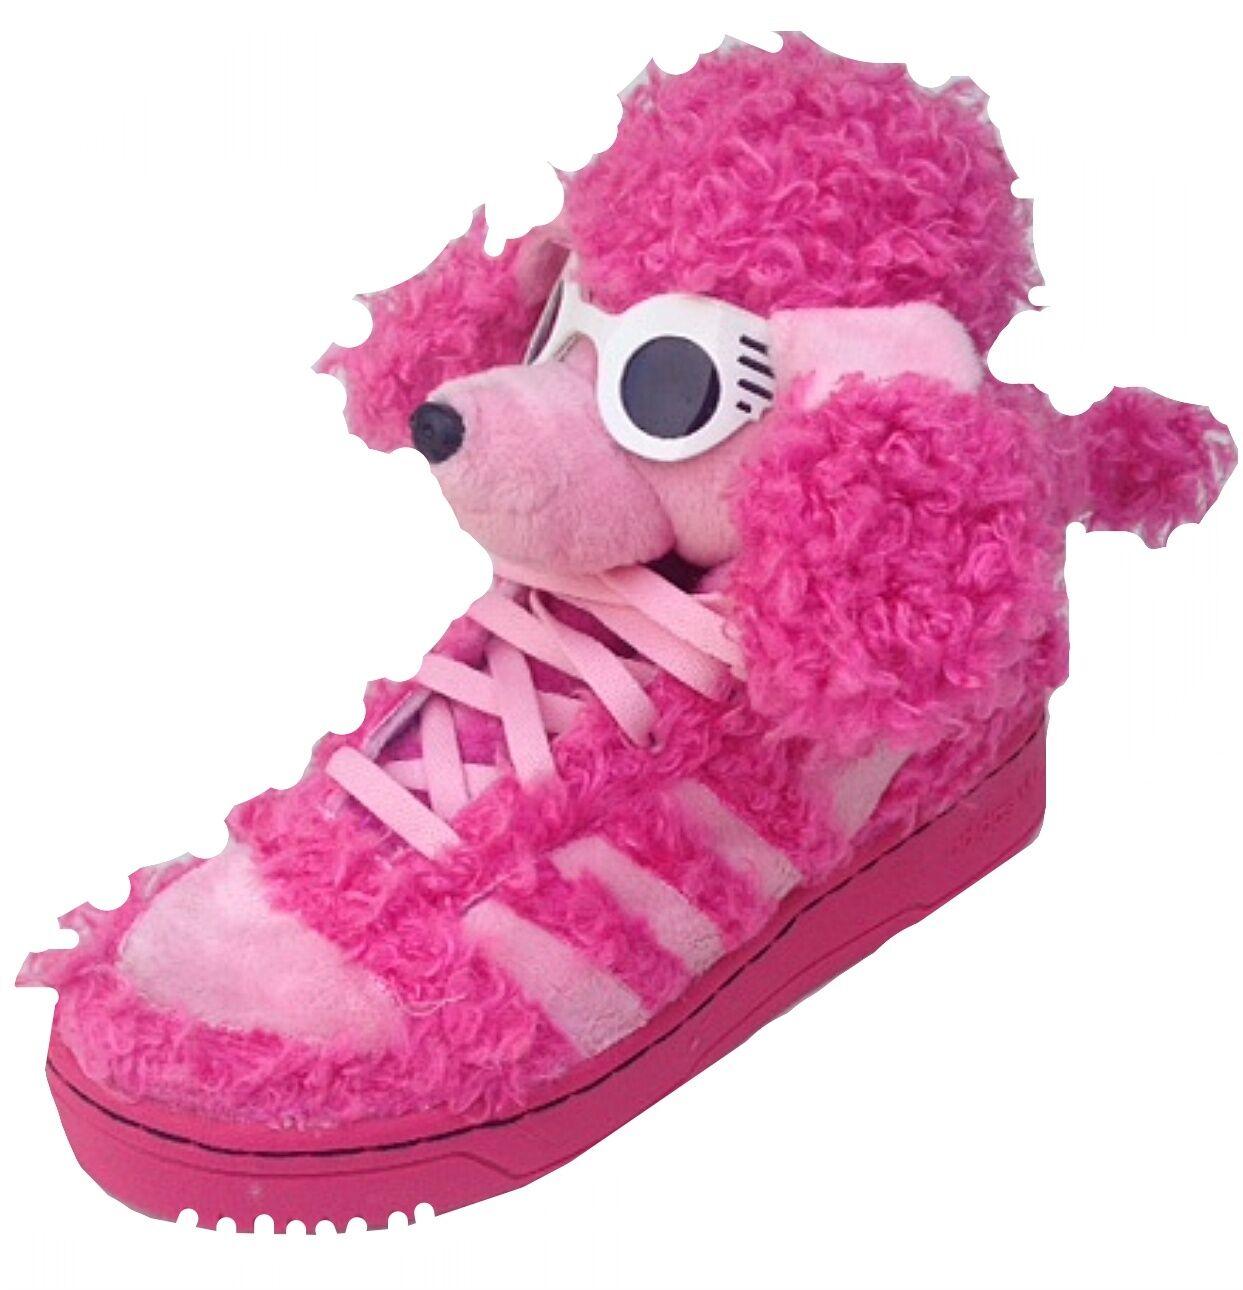 Adidas Bota Originals Hombre JEREMY SCOTT Caniche Bota Adidas Media Zapatillas q23499 GB da9f0e